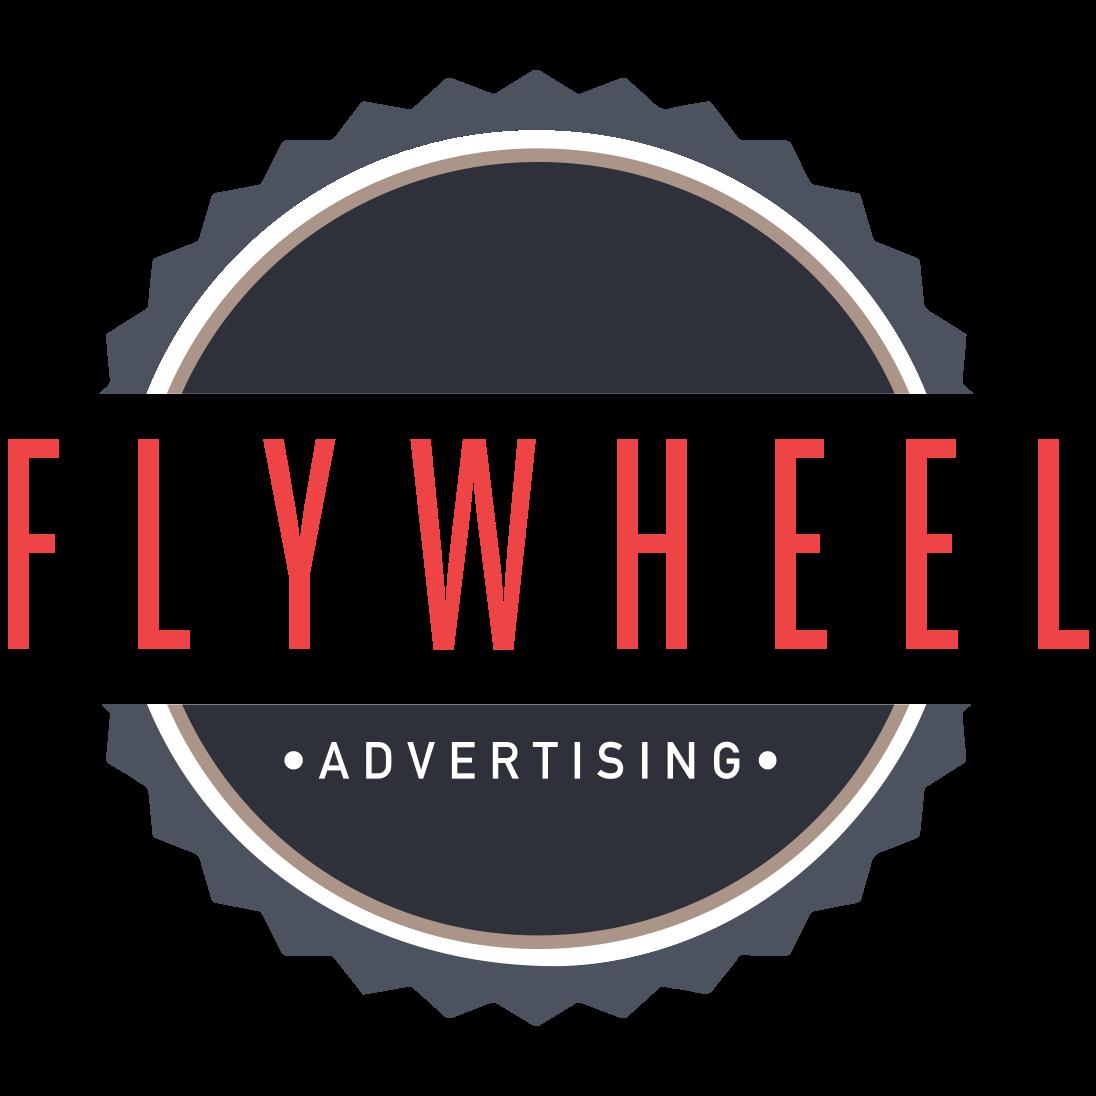 Flywheel Advertising | Columbus, Ohio Digital Marketing Agency